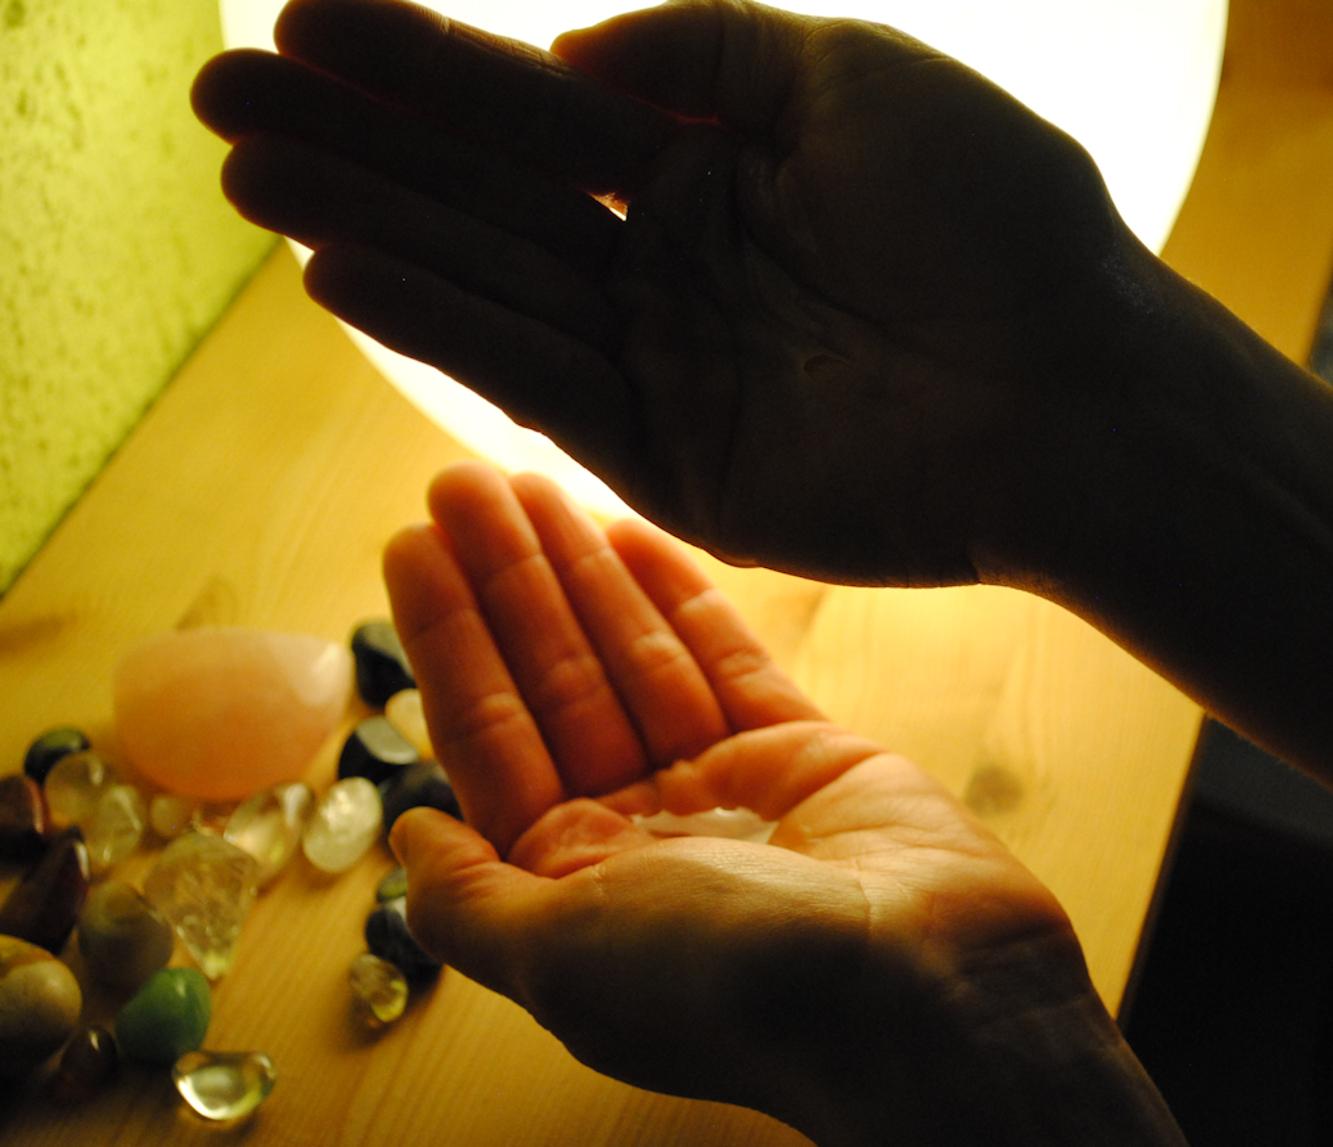 http://www.physio-scherdel.de/wp-content/uploads/2017/03/massage02.jpg